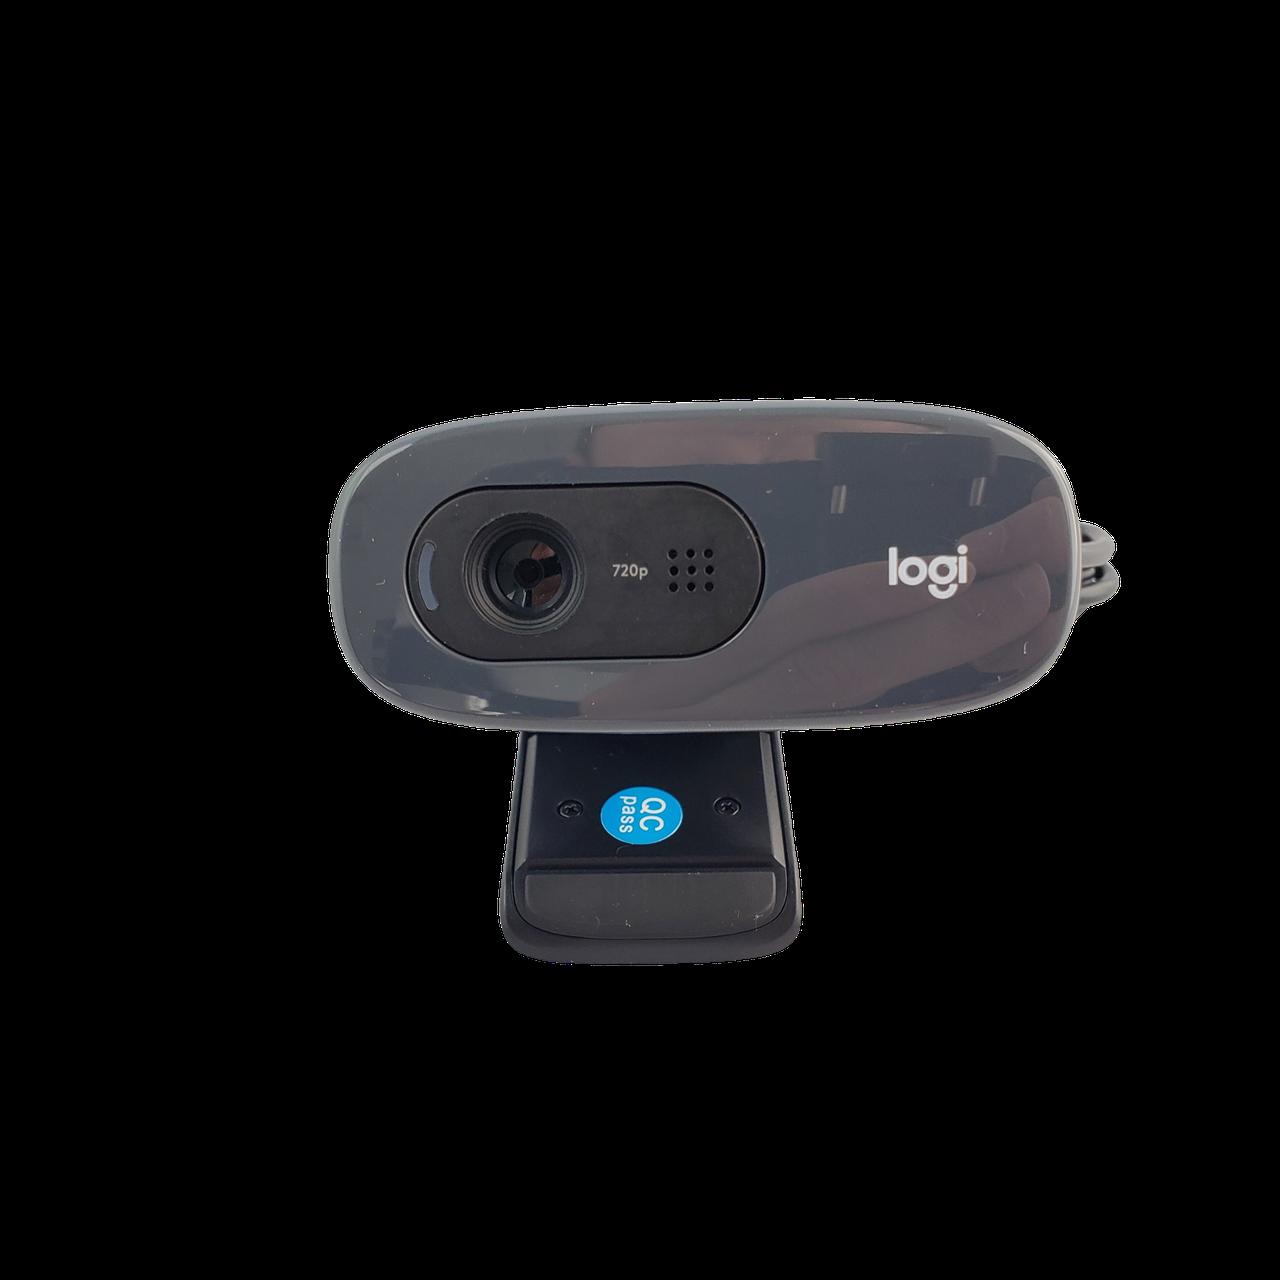 Logitech C270 HD Webcam Simple 720p video calls Black Grade C Refurbished (Уценка)